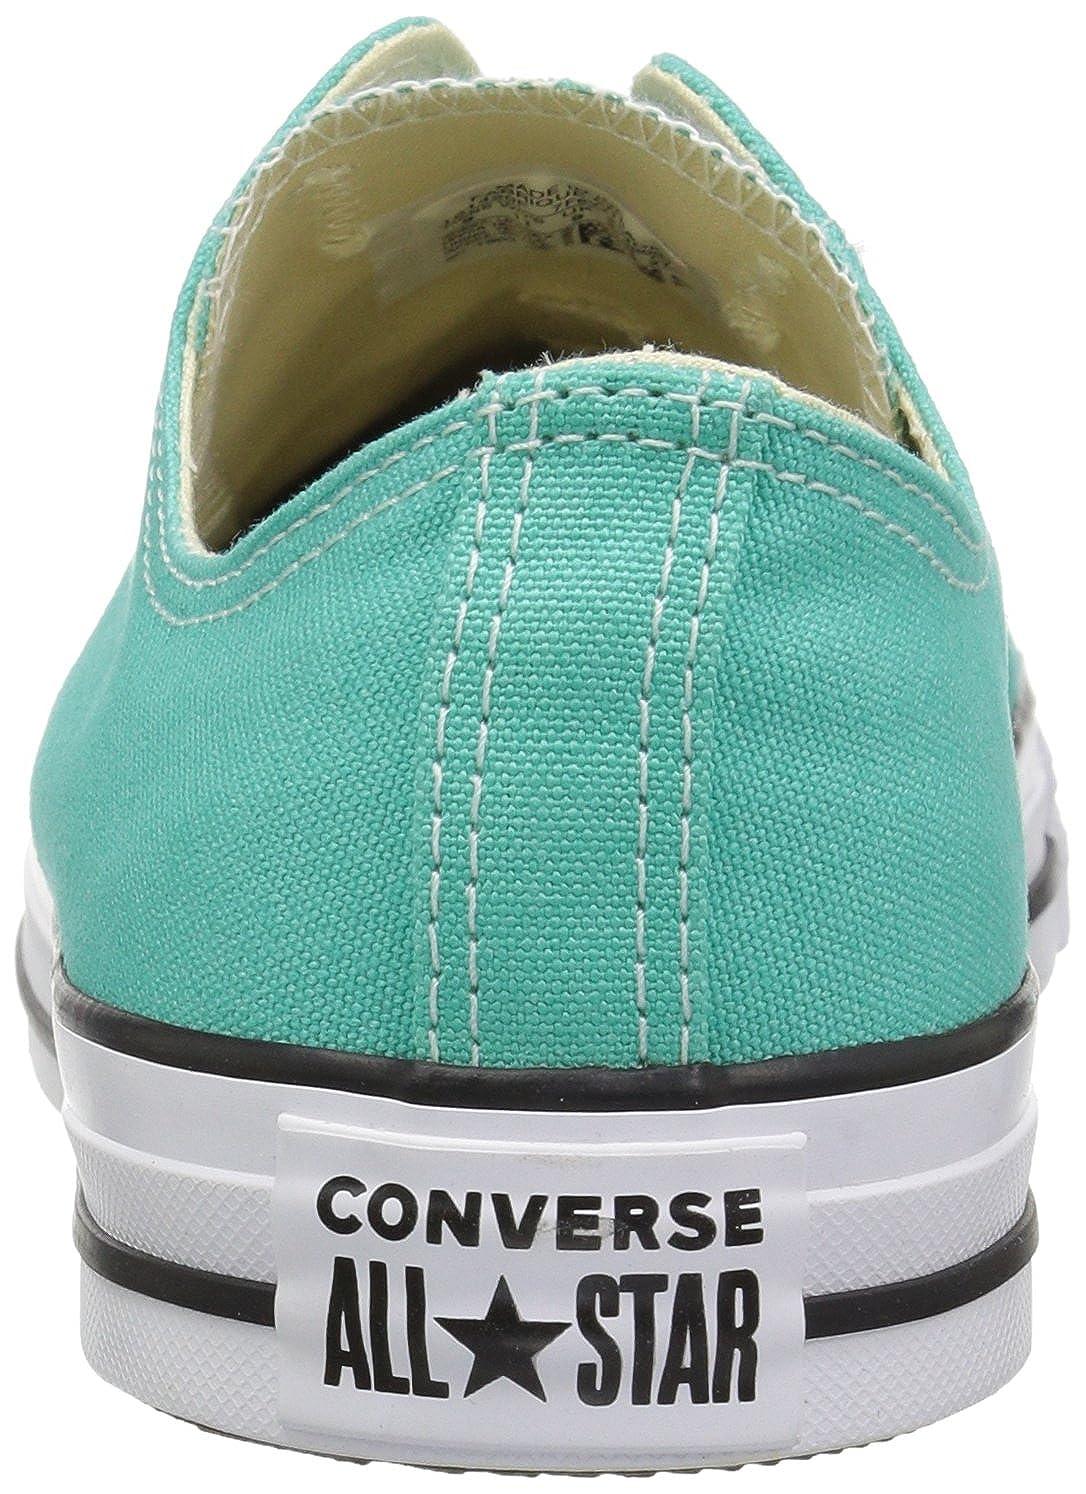 Converse AS AS AS Hi Can charcoal 1J793 Unisex-Erwachsene Turnschuhe B078NGWZ8D Skateboardschuhe Hochwertig 05dab9